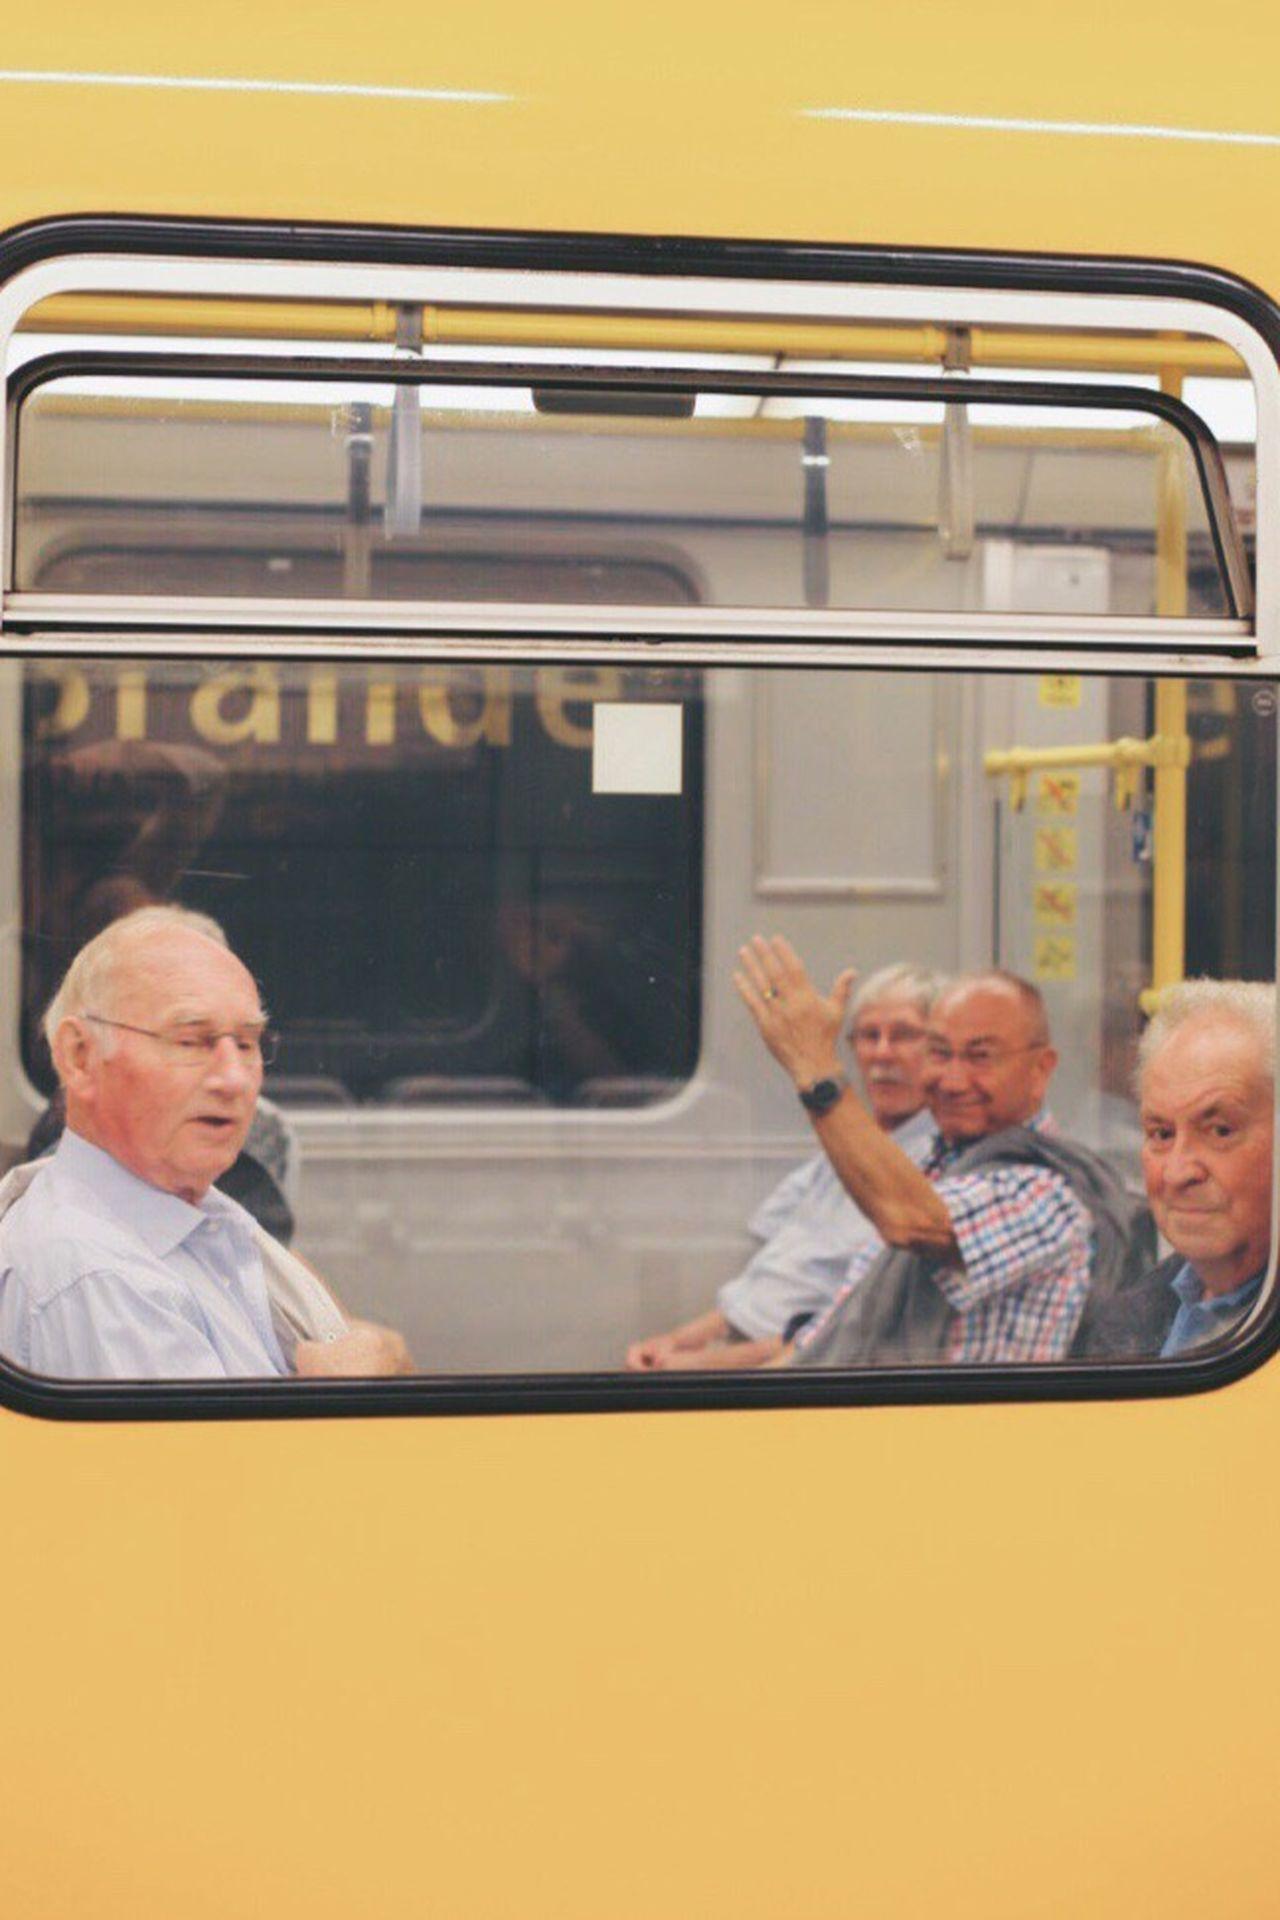 Train Station Bvg Senior Adult Senior Men Transportation Senior Women Men Senior Couple Headshot Public Transportation Mature Men Togetherness Gray Hair Yellow Land Vehicle Group Of People Lifestyles Sitting Day Human Body Part Adult